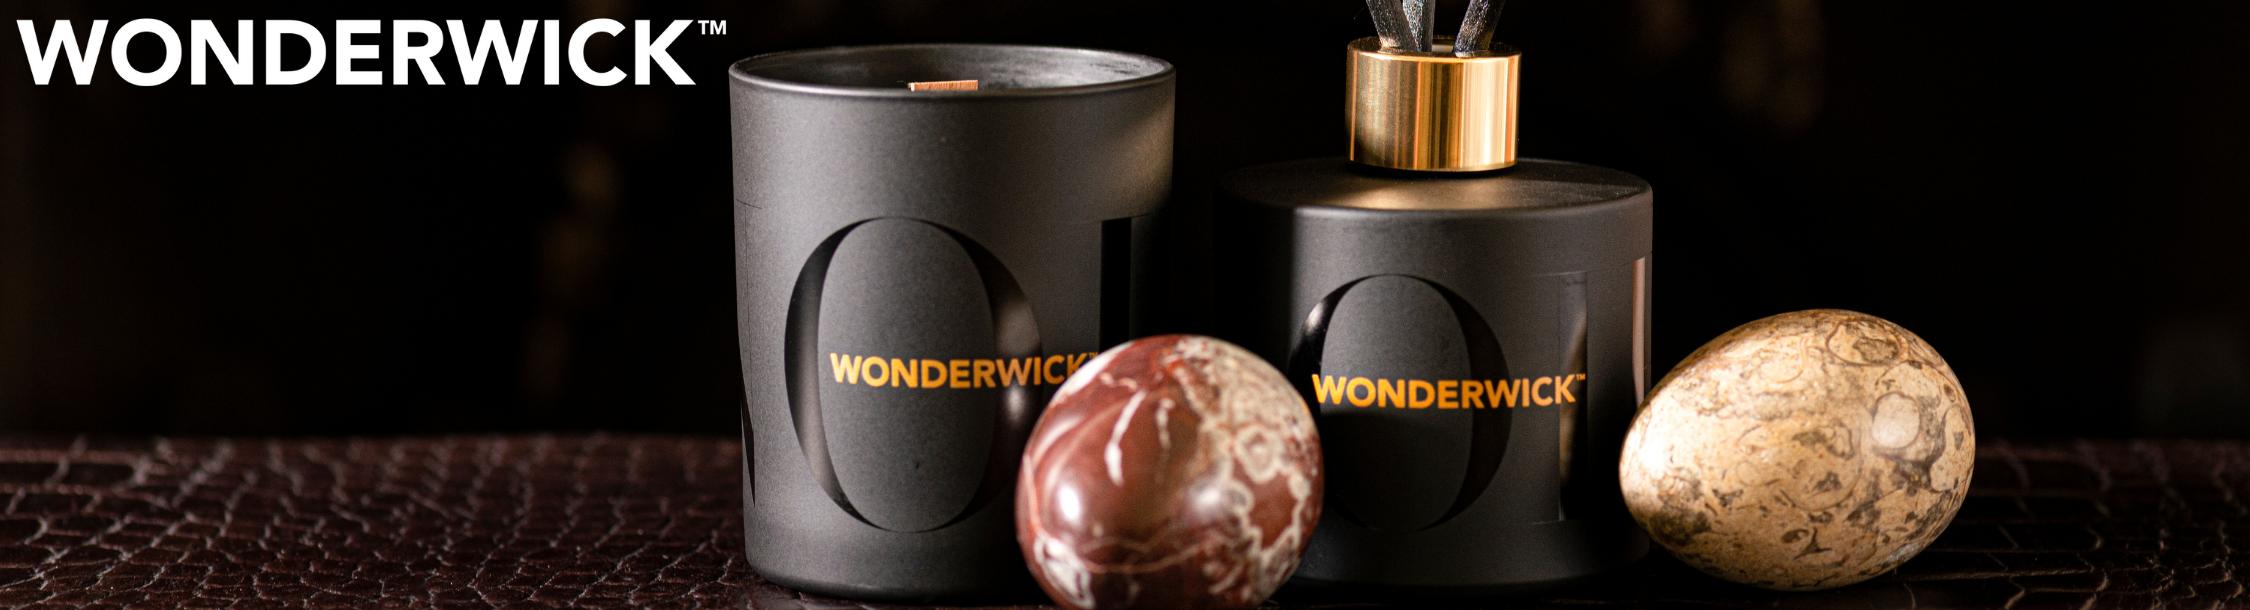 Wonderwick Noir